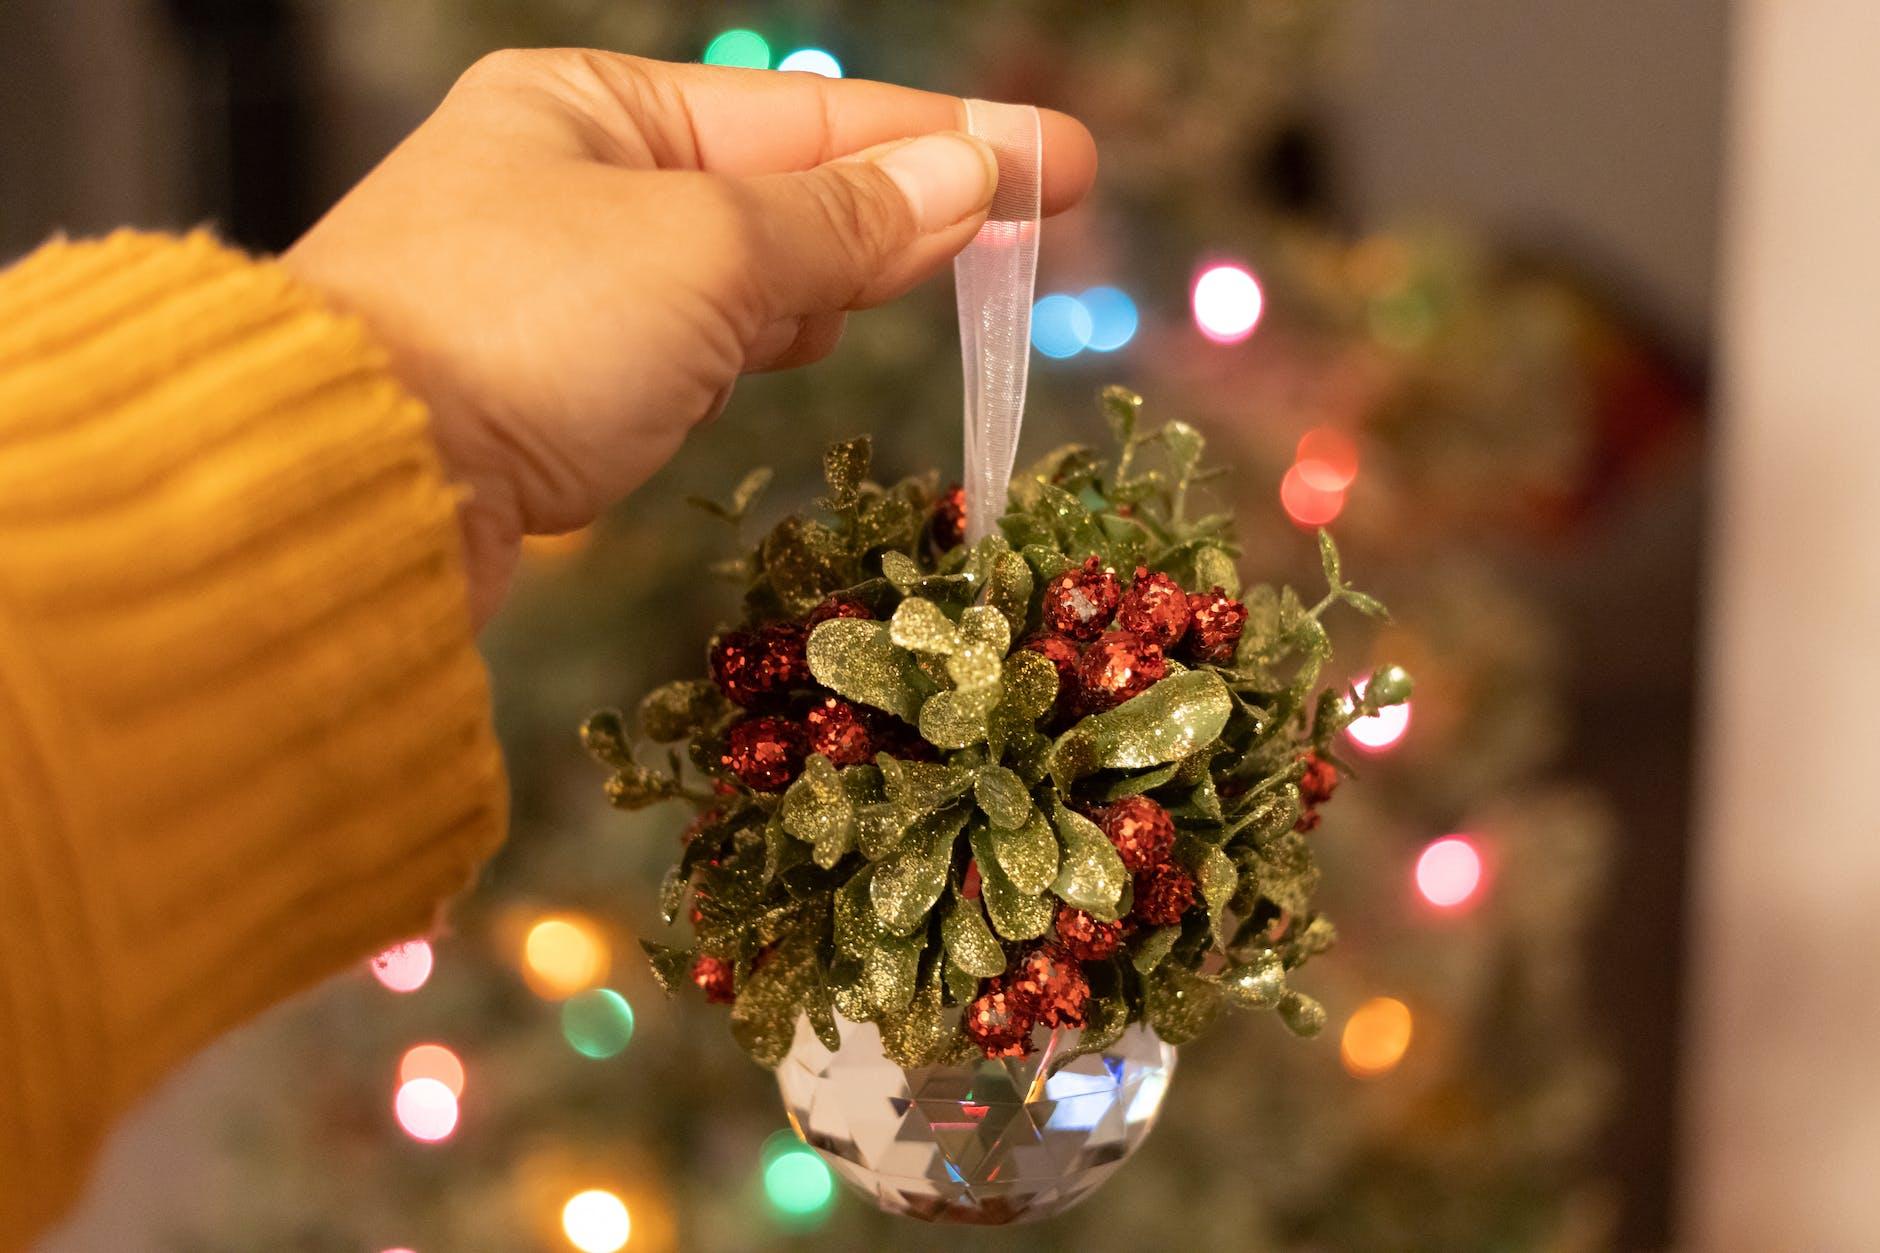 mistletoe, Christmas world travel quiz 2020